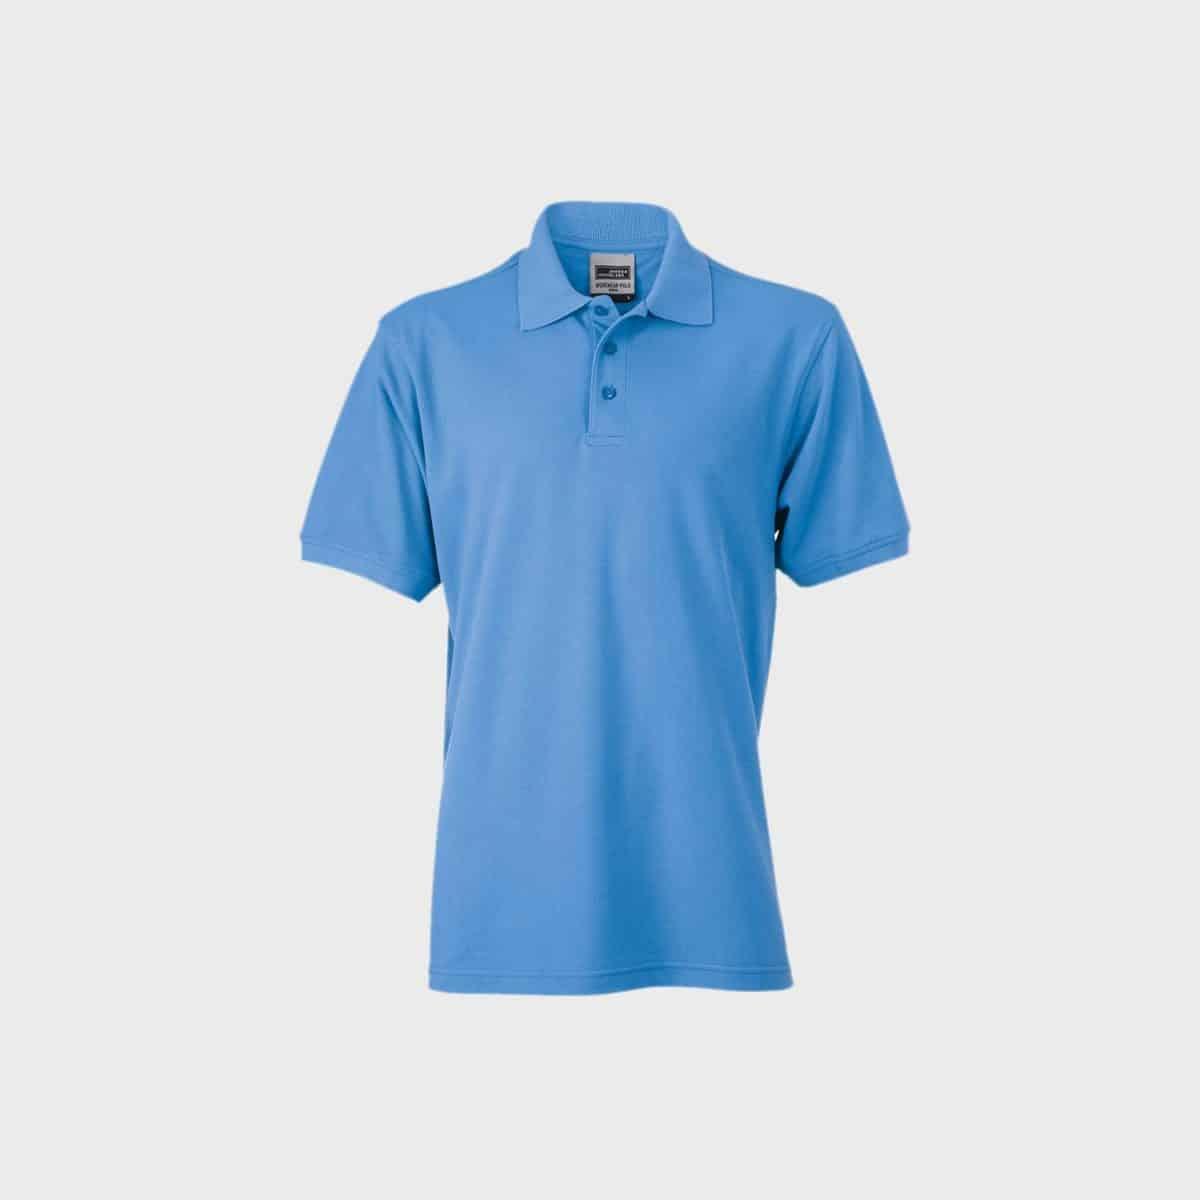 basic-workwear-polo-t-shirt-herren-aqua-kaufen-besticken_stickmanufaktur